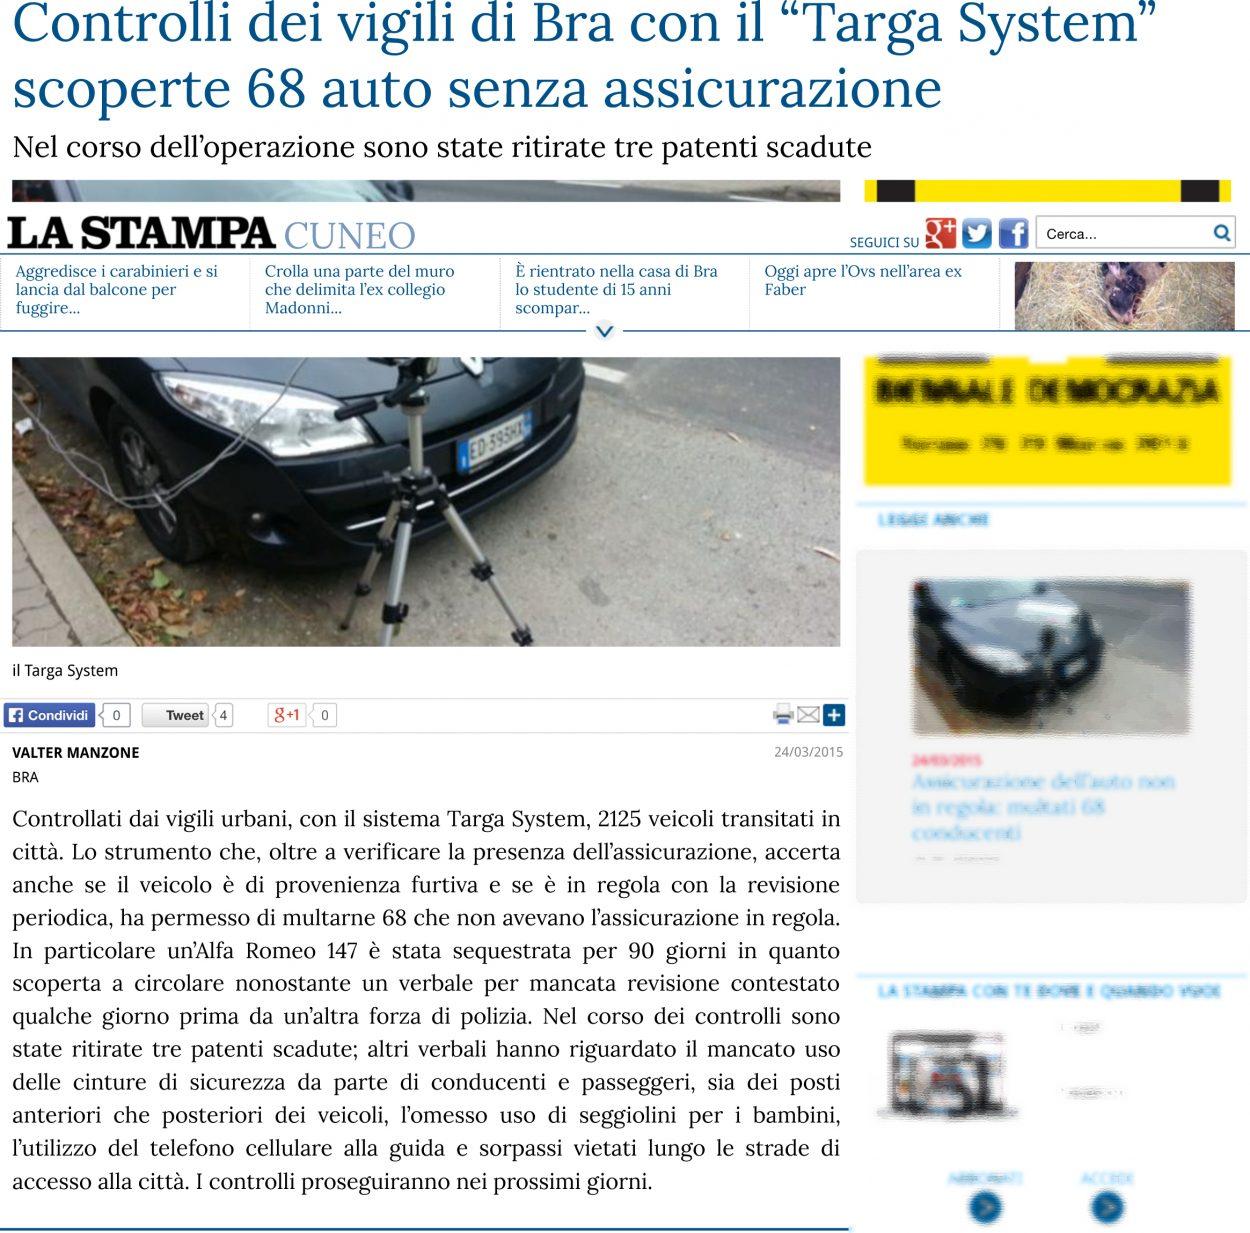 Tagliando assicurativo addio Targa System